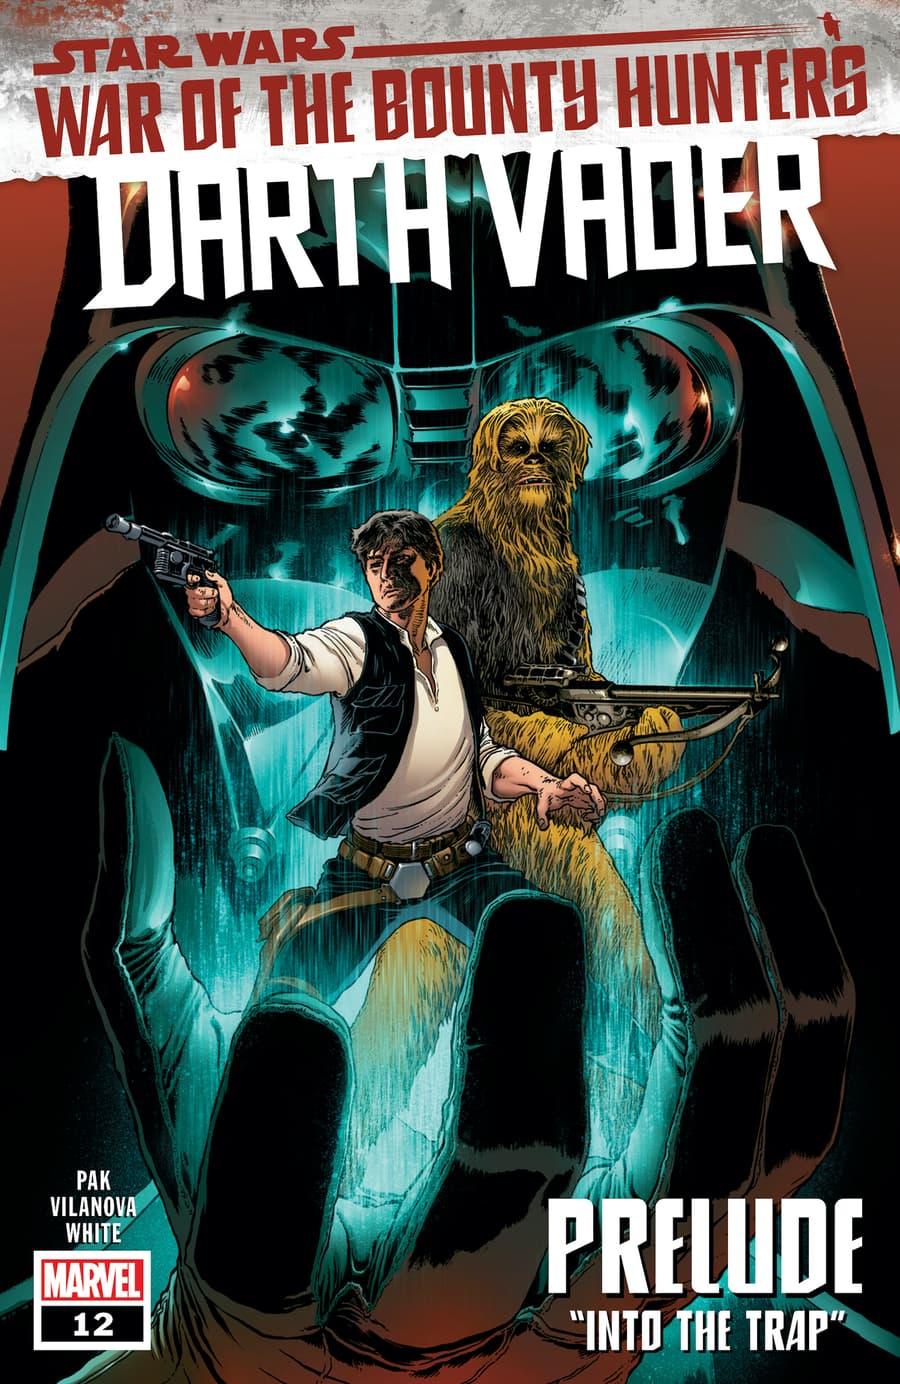 STAR WARS: DARTH VADER #12cover by Aaron Kuder